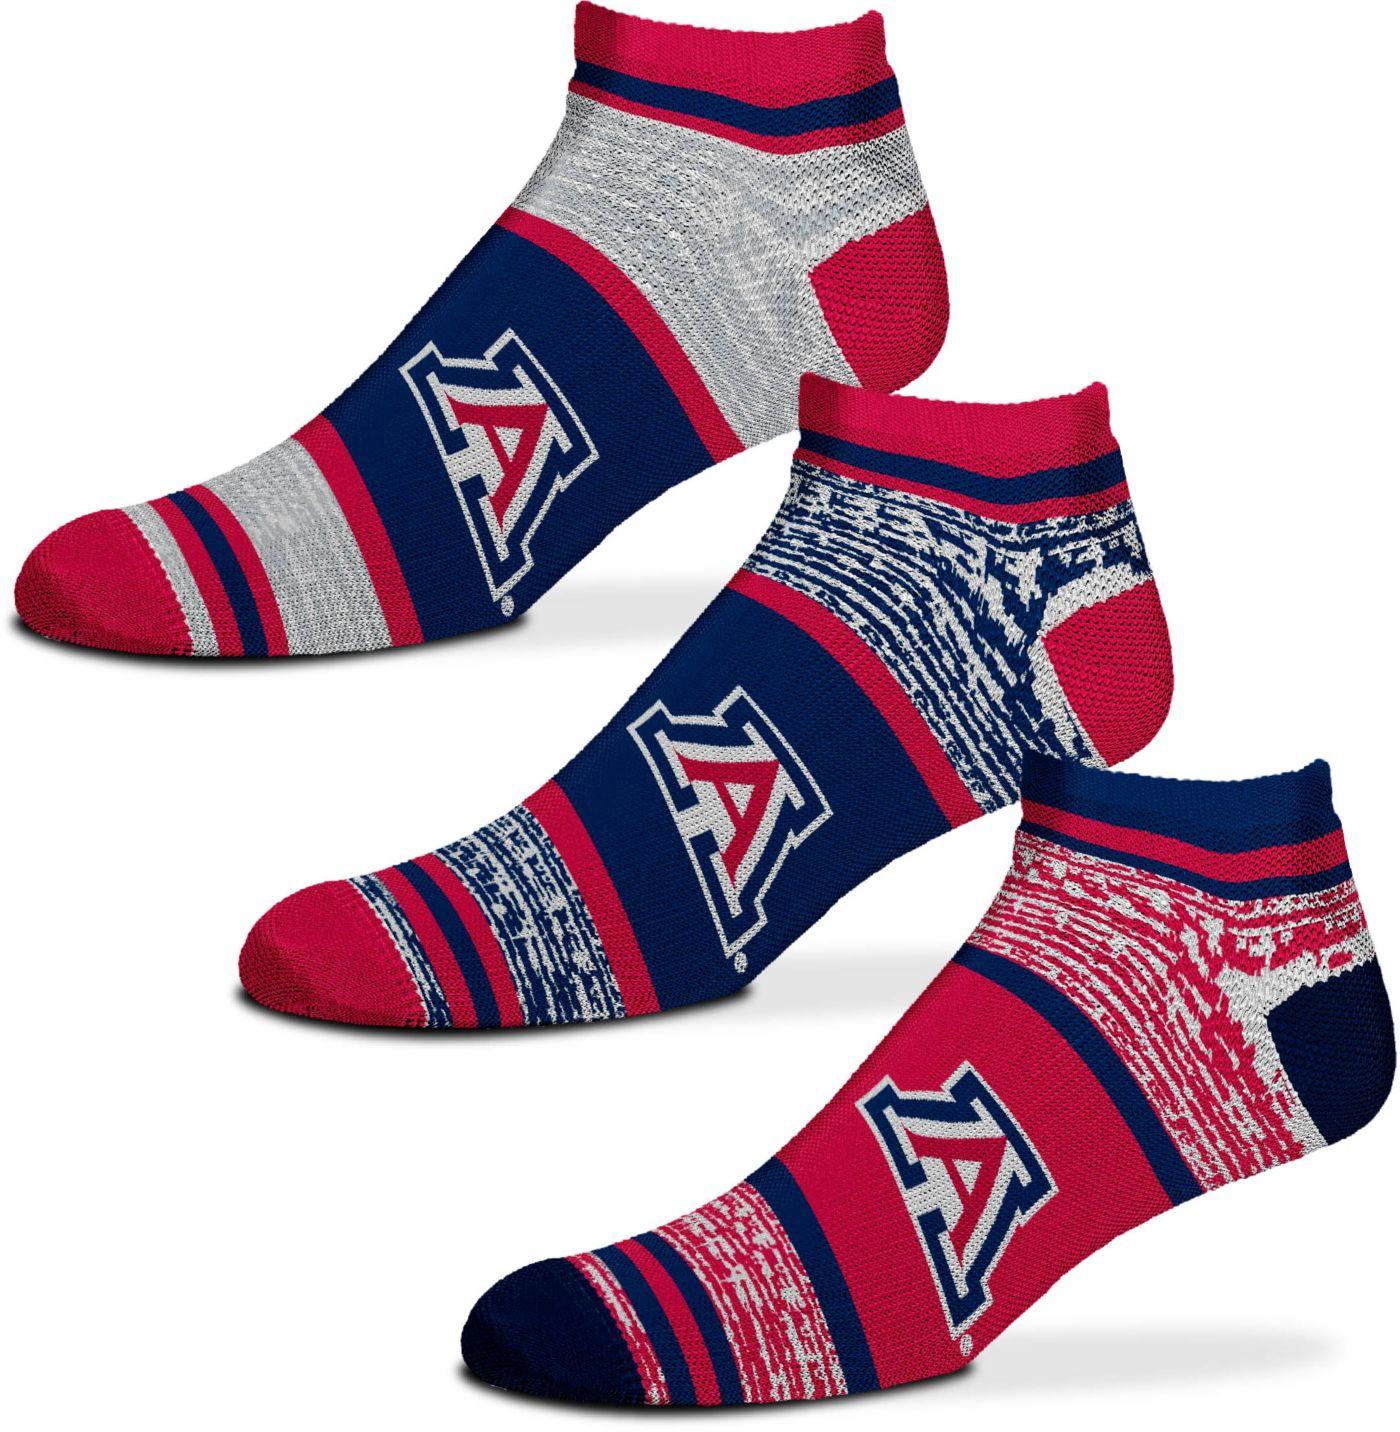 For Bare Feet Arizona Wildcats 3 Pack Socks